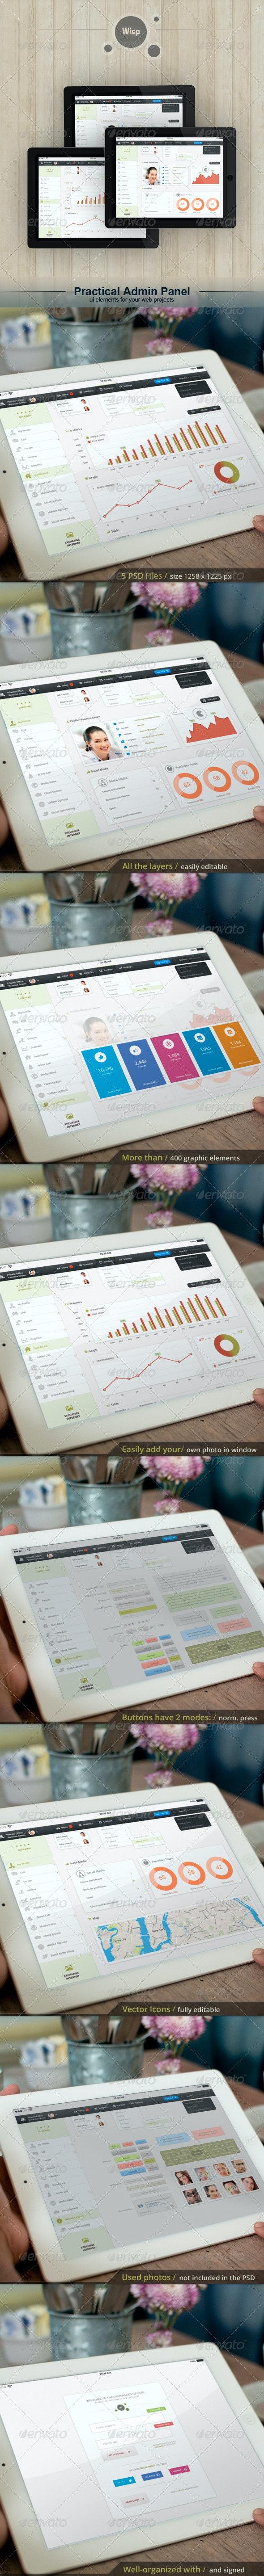 Tablet App. Wisp - Admin Panel - User Interfaces Web Elements